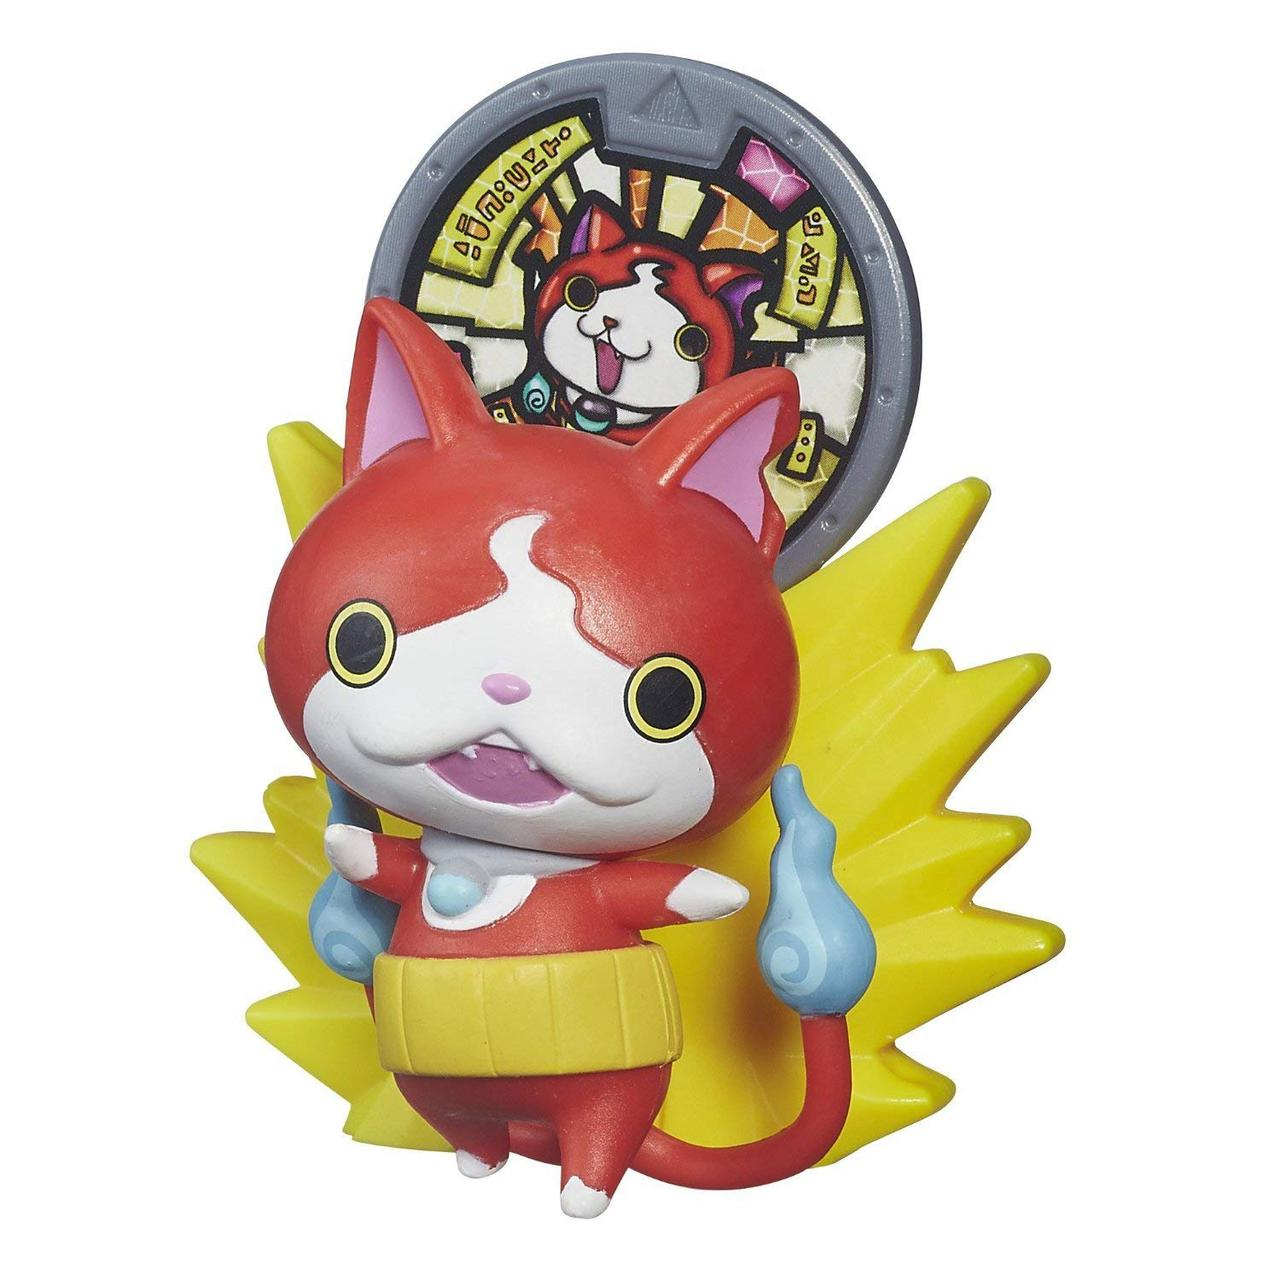 Фигурка Yo-Kai Watch с медалью - Jibanyan. Оригинал Hasbro B5938/B5937